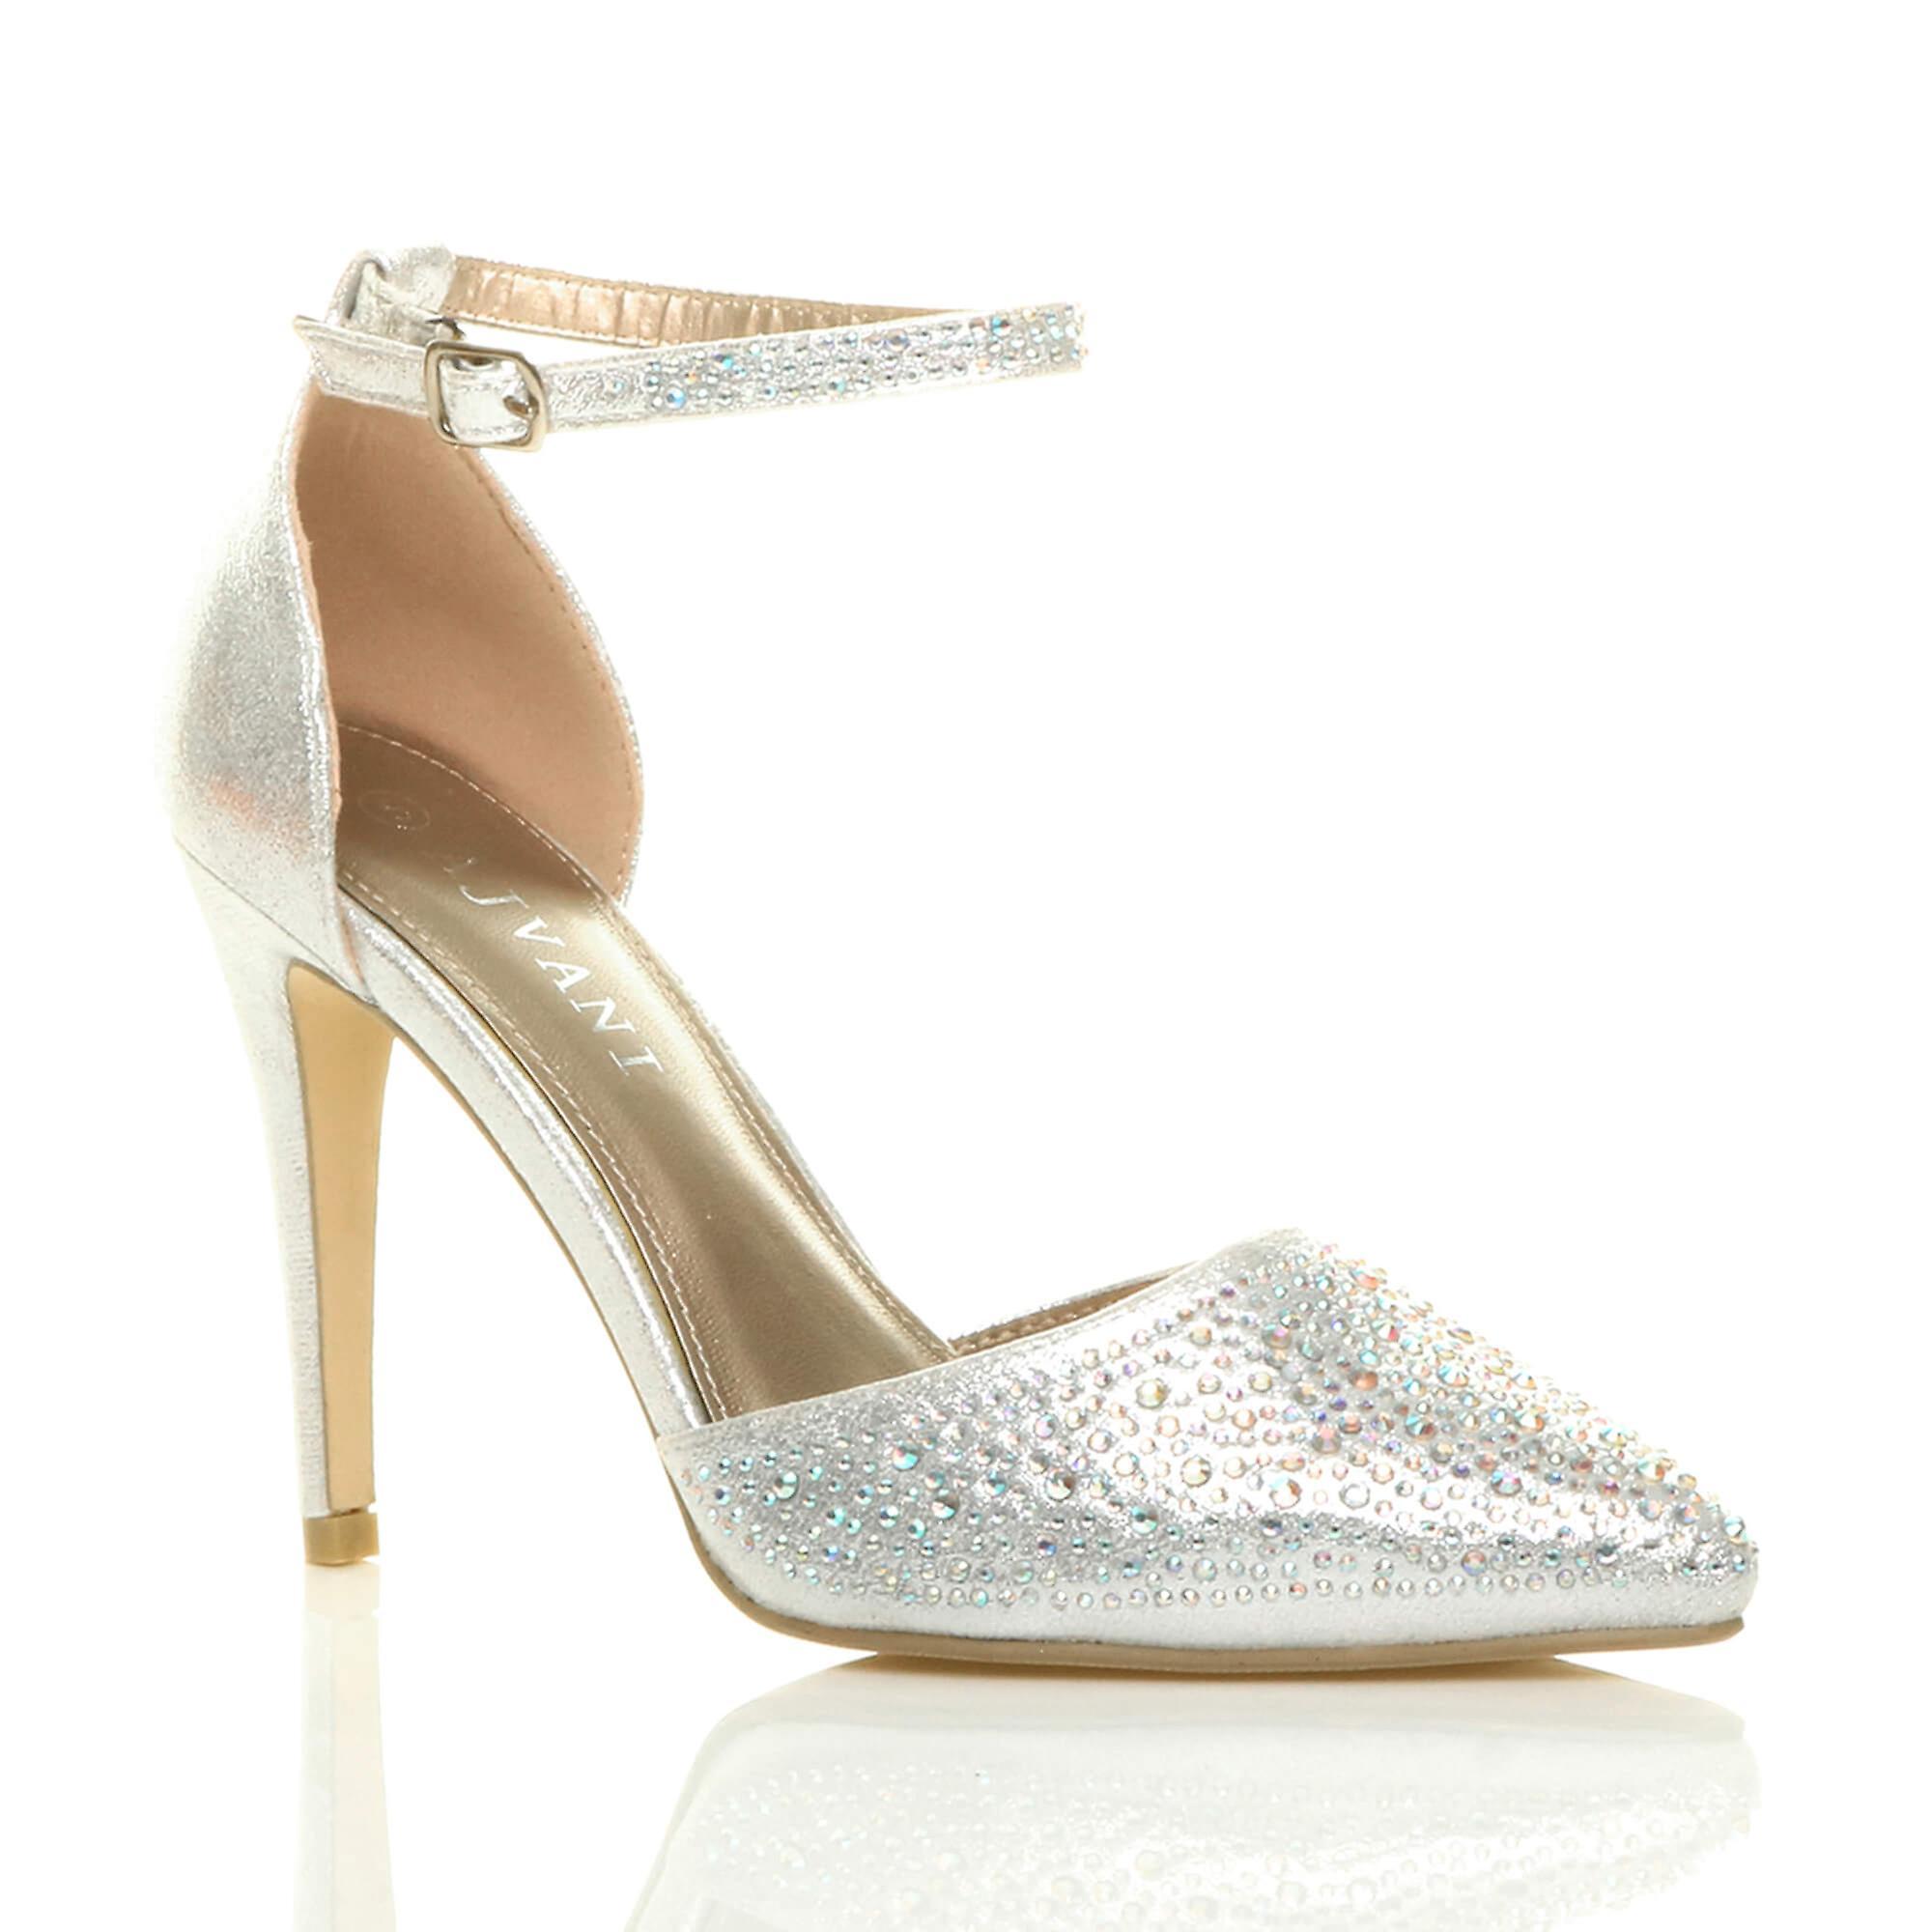 Ajvani Damen high Heels spitz Knöchel Abschlussball Hochzeit Diamante Gericht Schuhe Sandalen